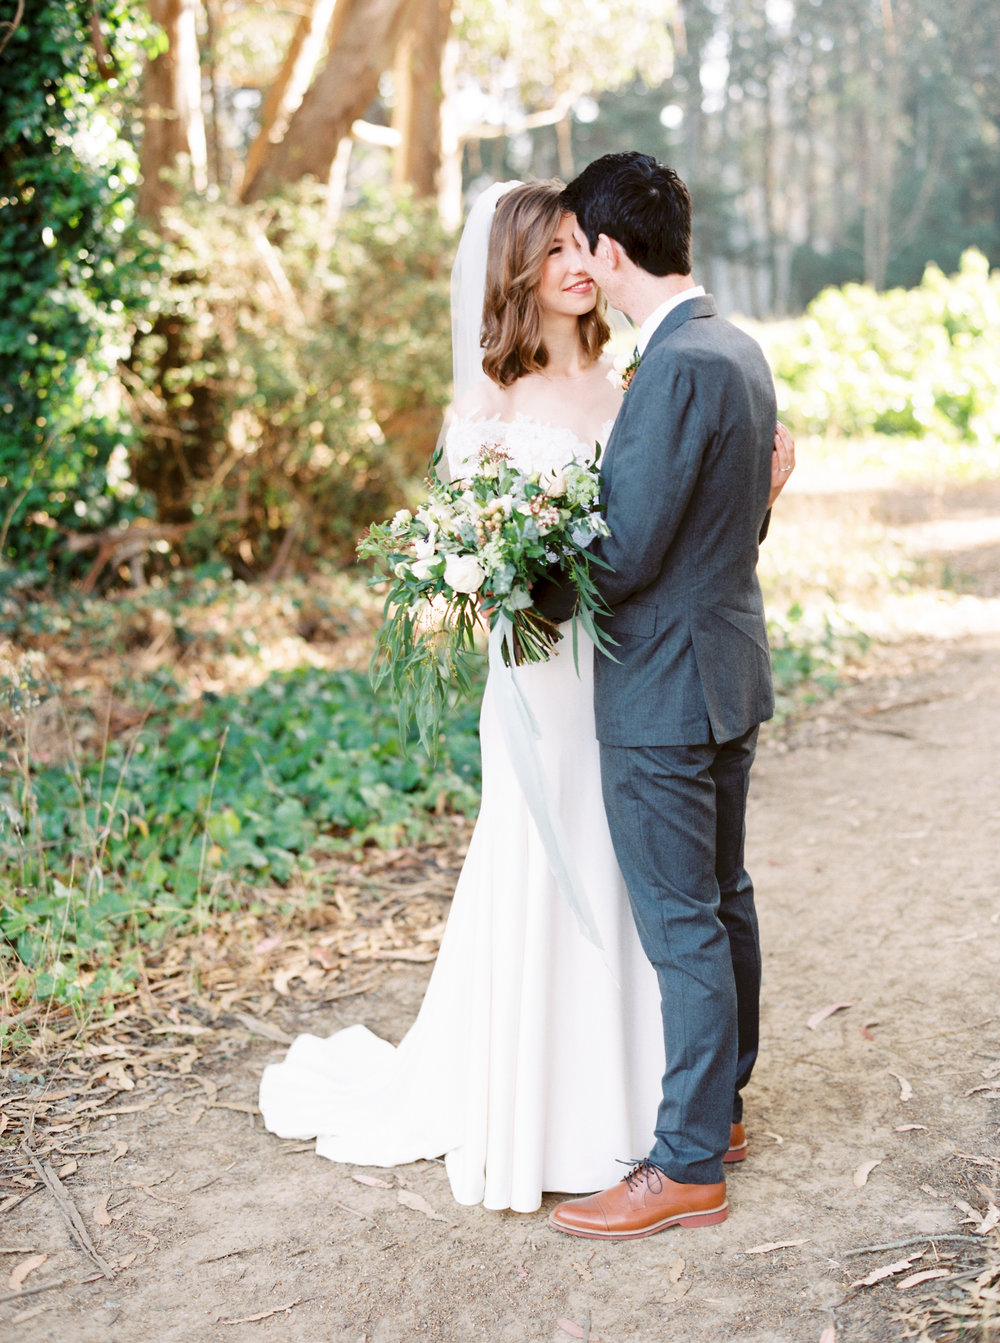 Log-cabin-wedding-in-presidio-san-francisco-california-desintation-wedding-photography-43.jpg